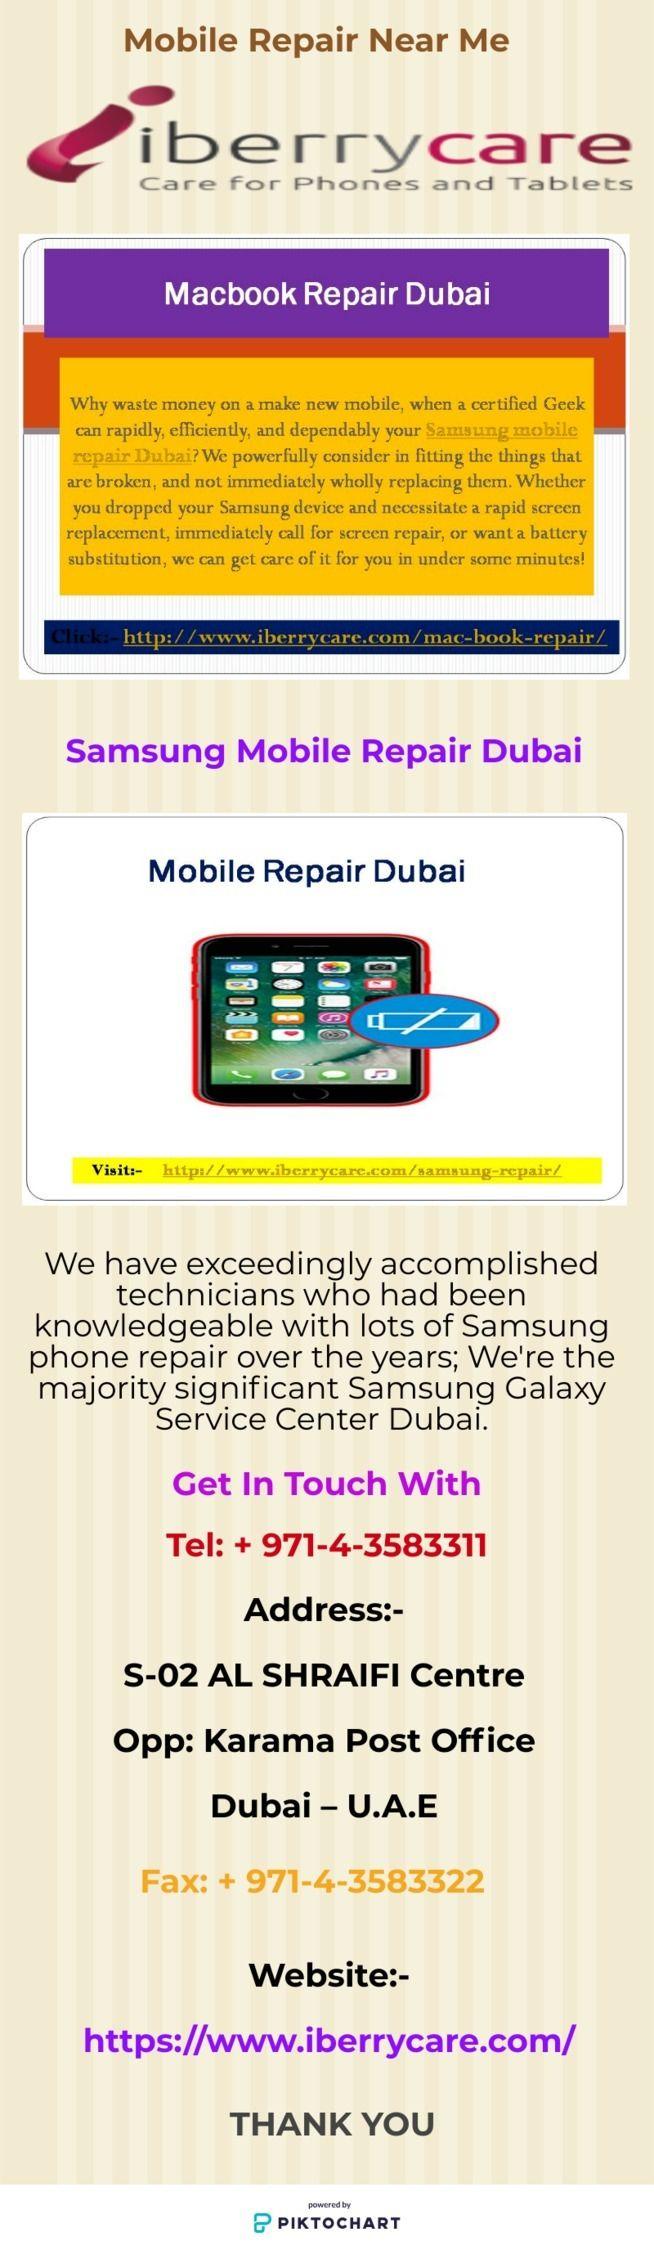 product repair immediately sugg - iberrycare | ello